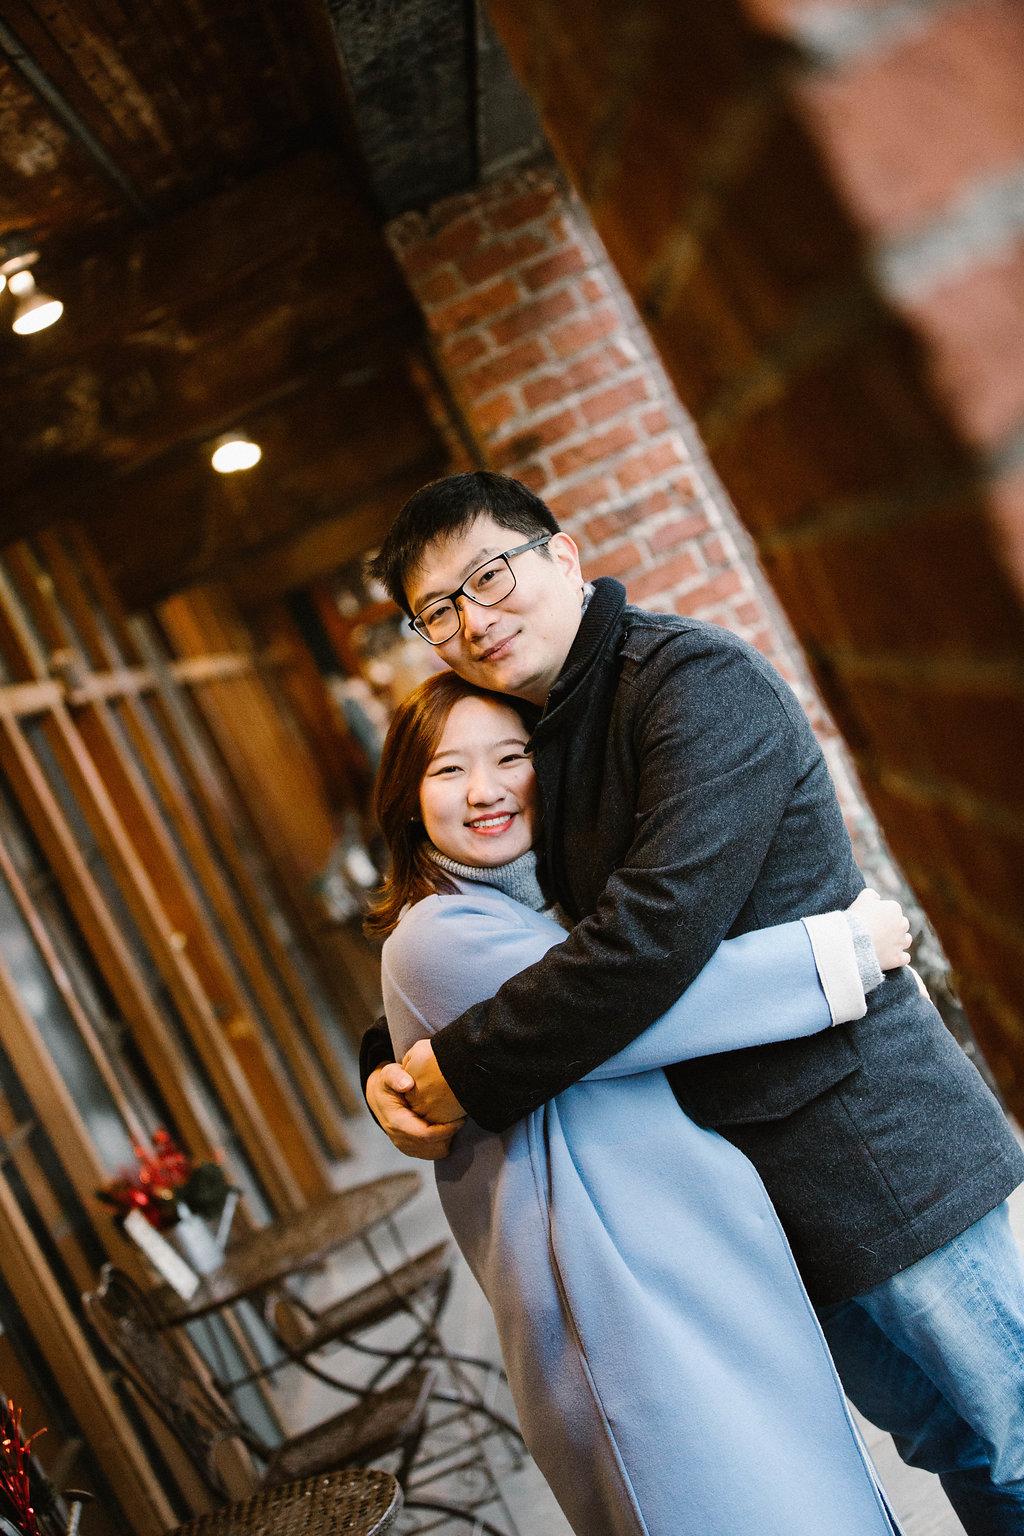 Qian+Jacson_best+Seattle+wedding+Photographer_APW22.JPG